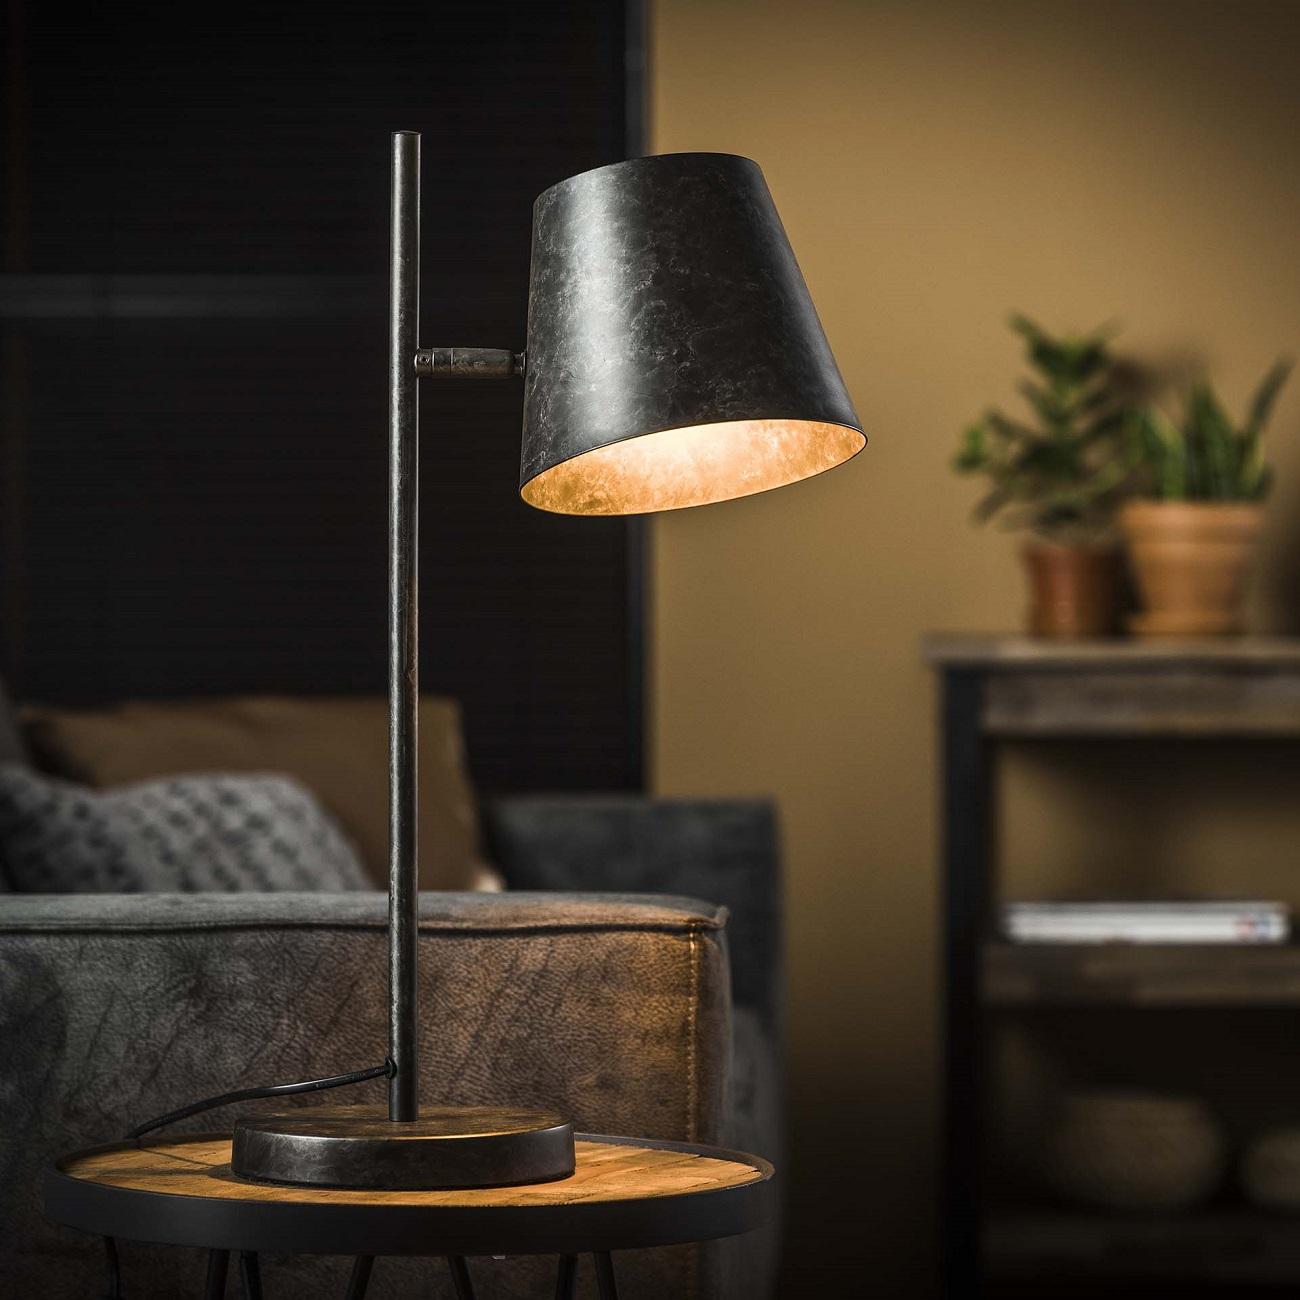 Tafellamp Class 55 cm hoog in Charcoal | Zaloni